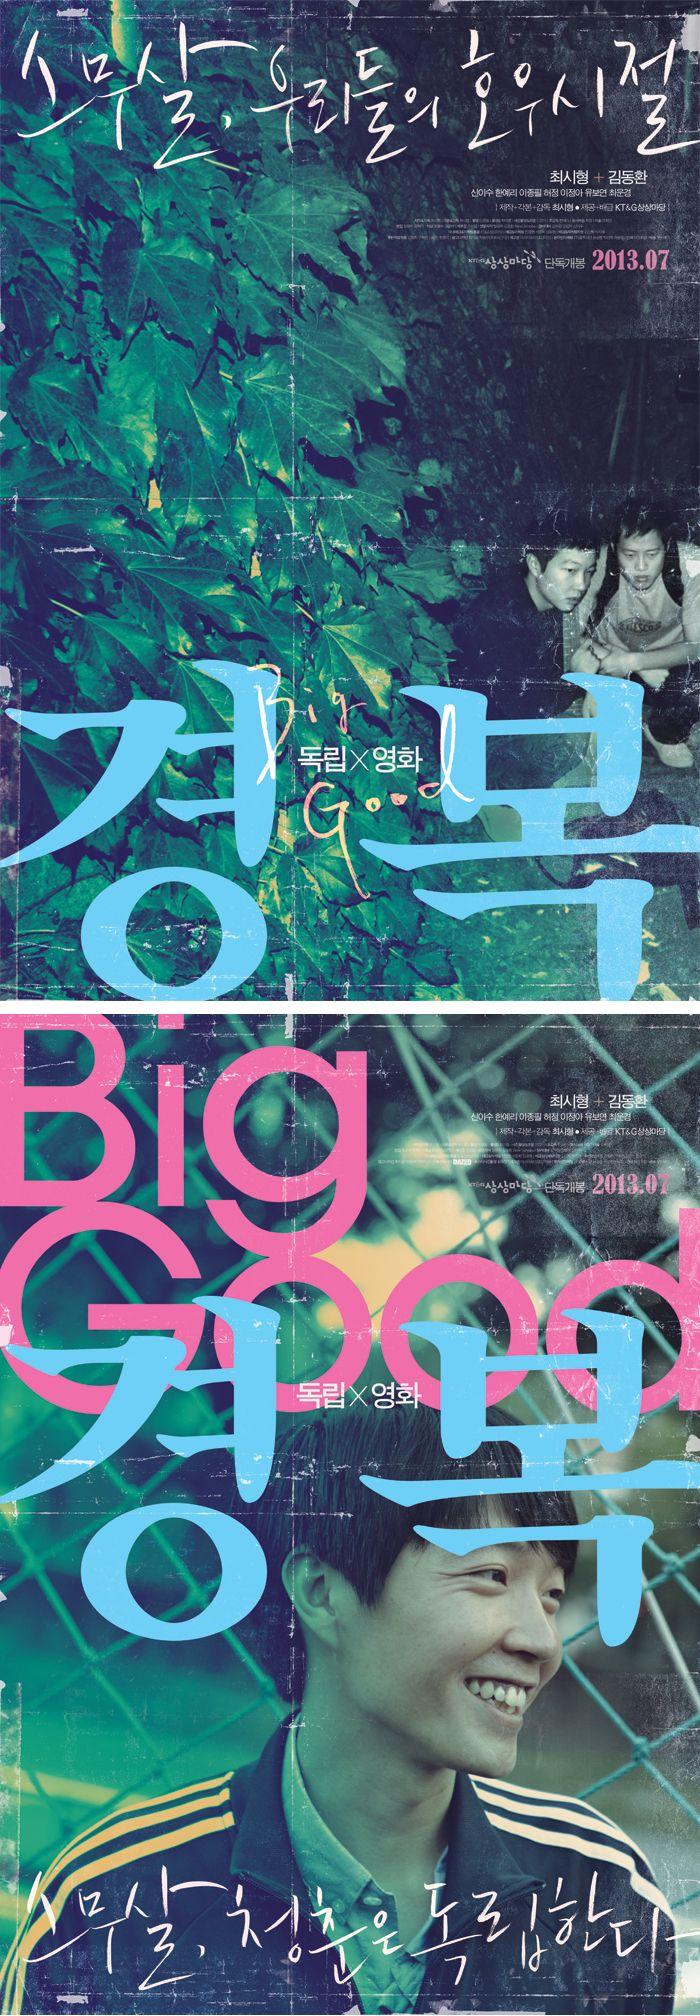 Film :: alternative graphics - PROPAGANDA :: - 경복 Big Good